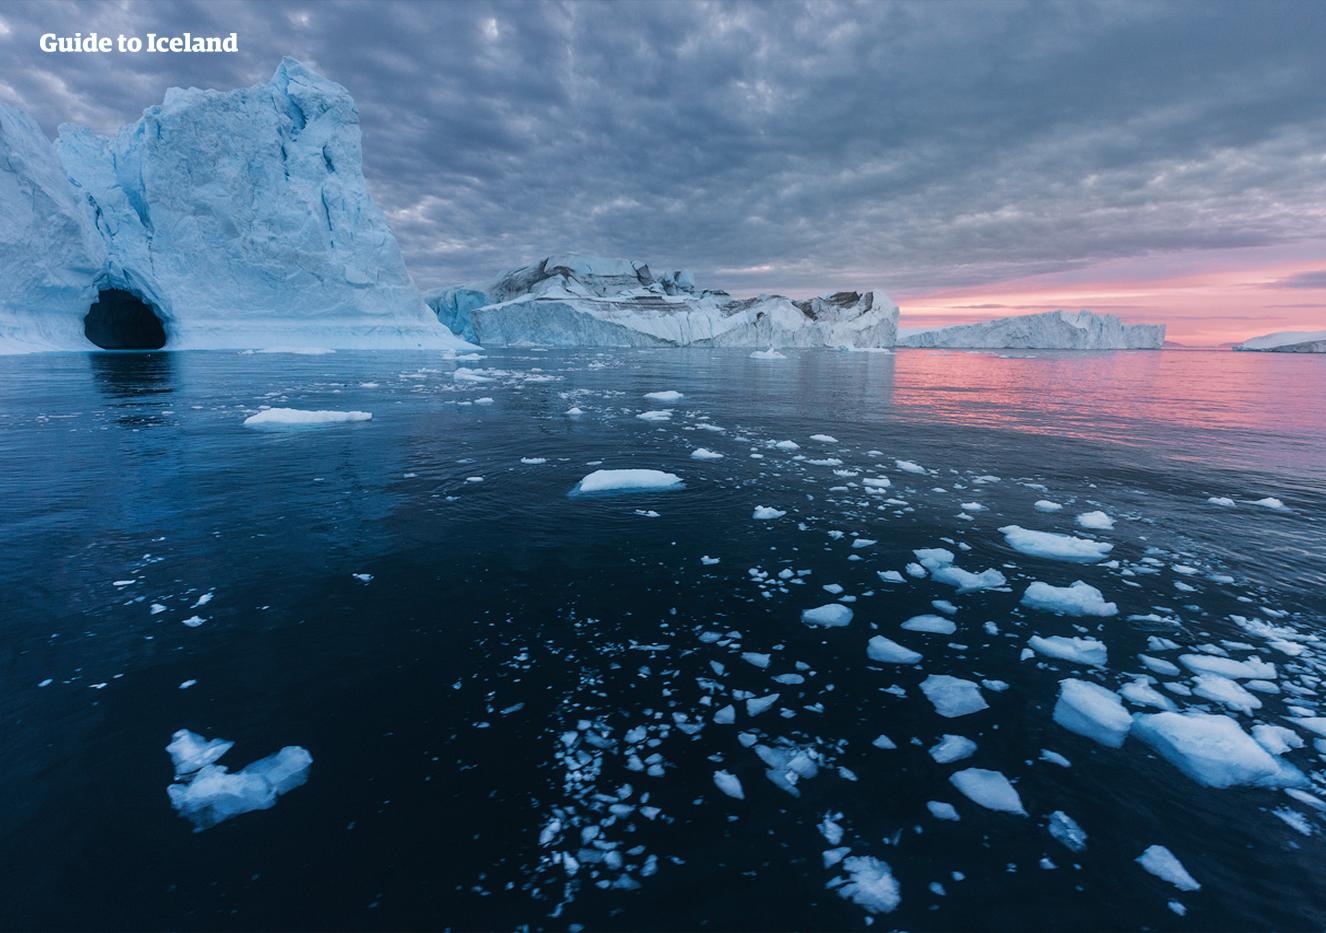 islandia-guide-to-iceland-6